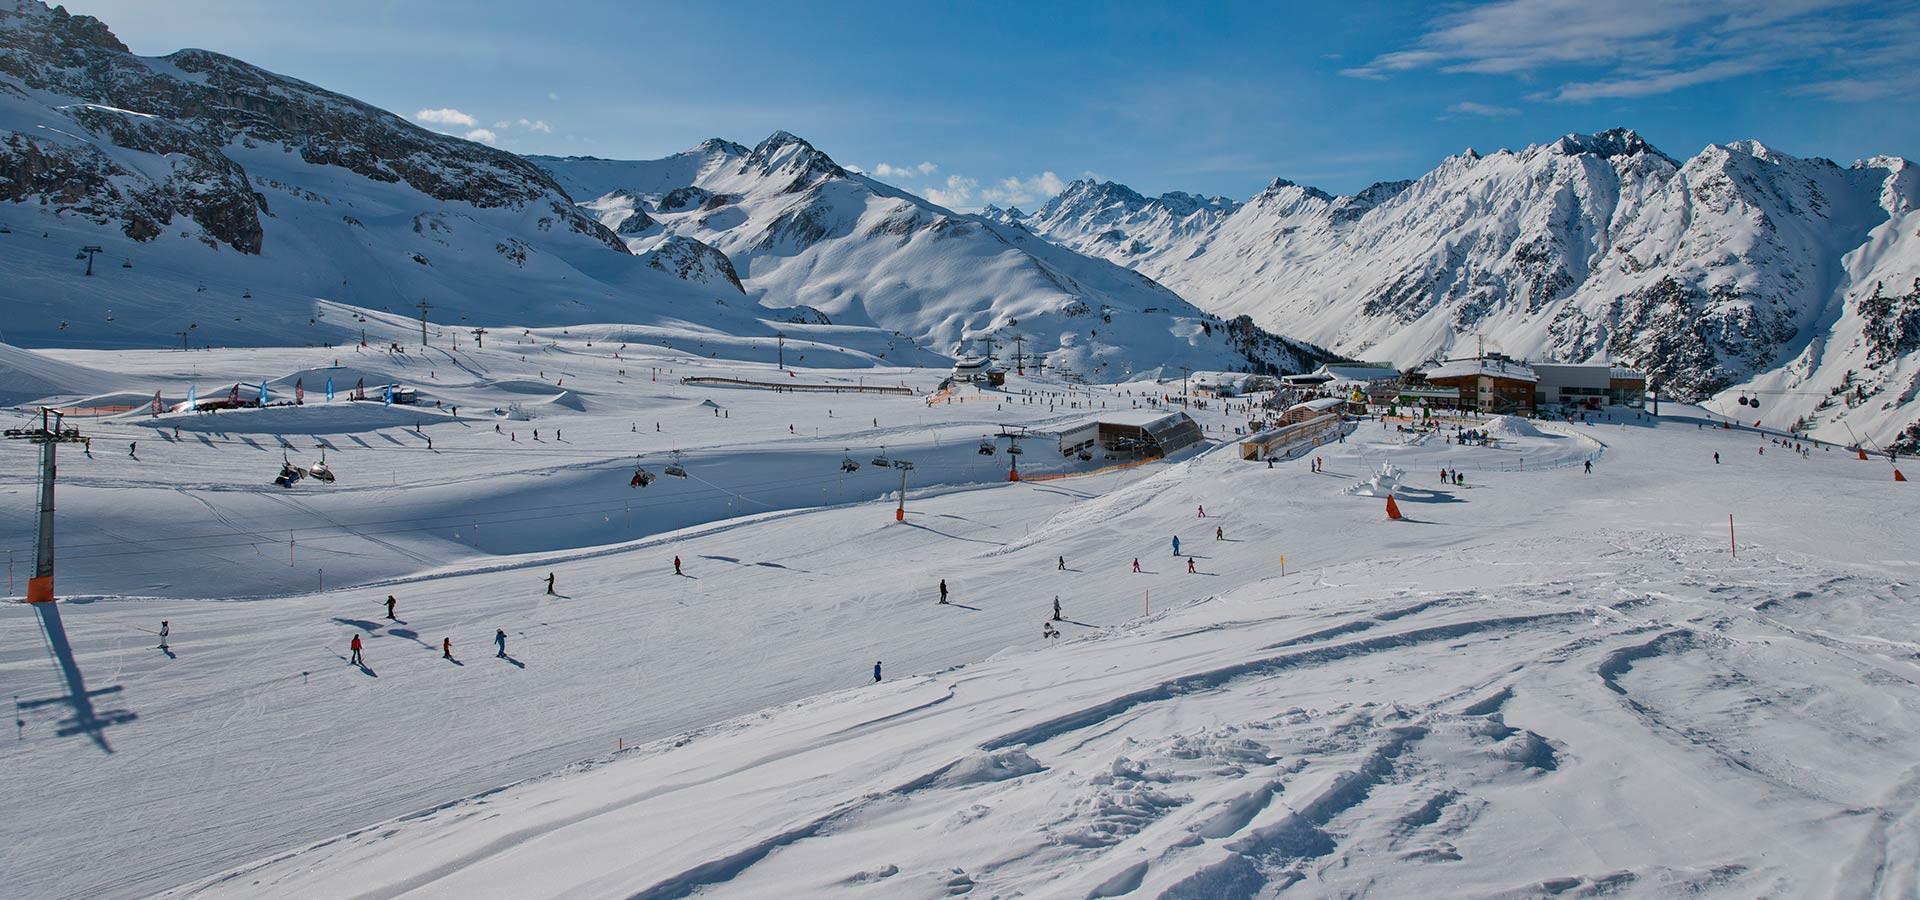 Boundless ski resort  Ischgl: a ski resort of superlatives